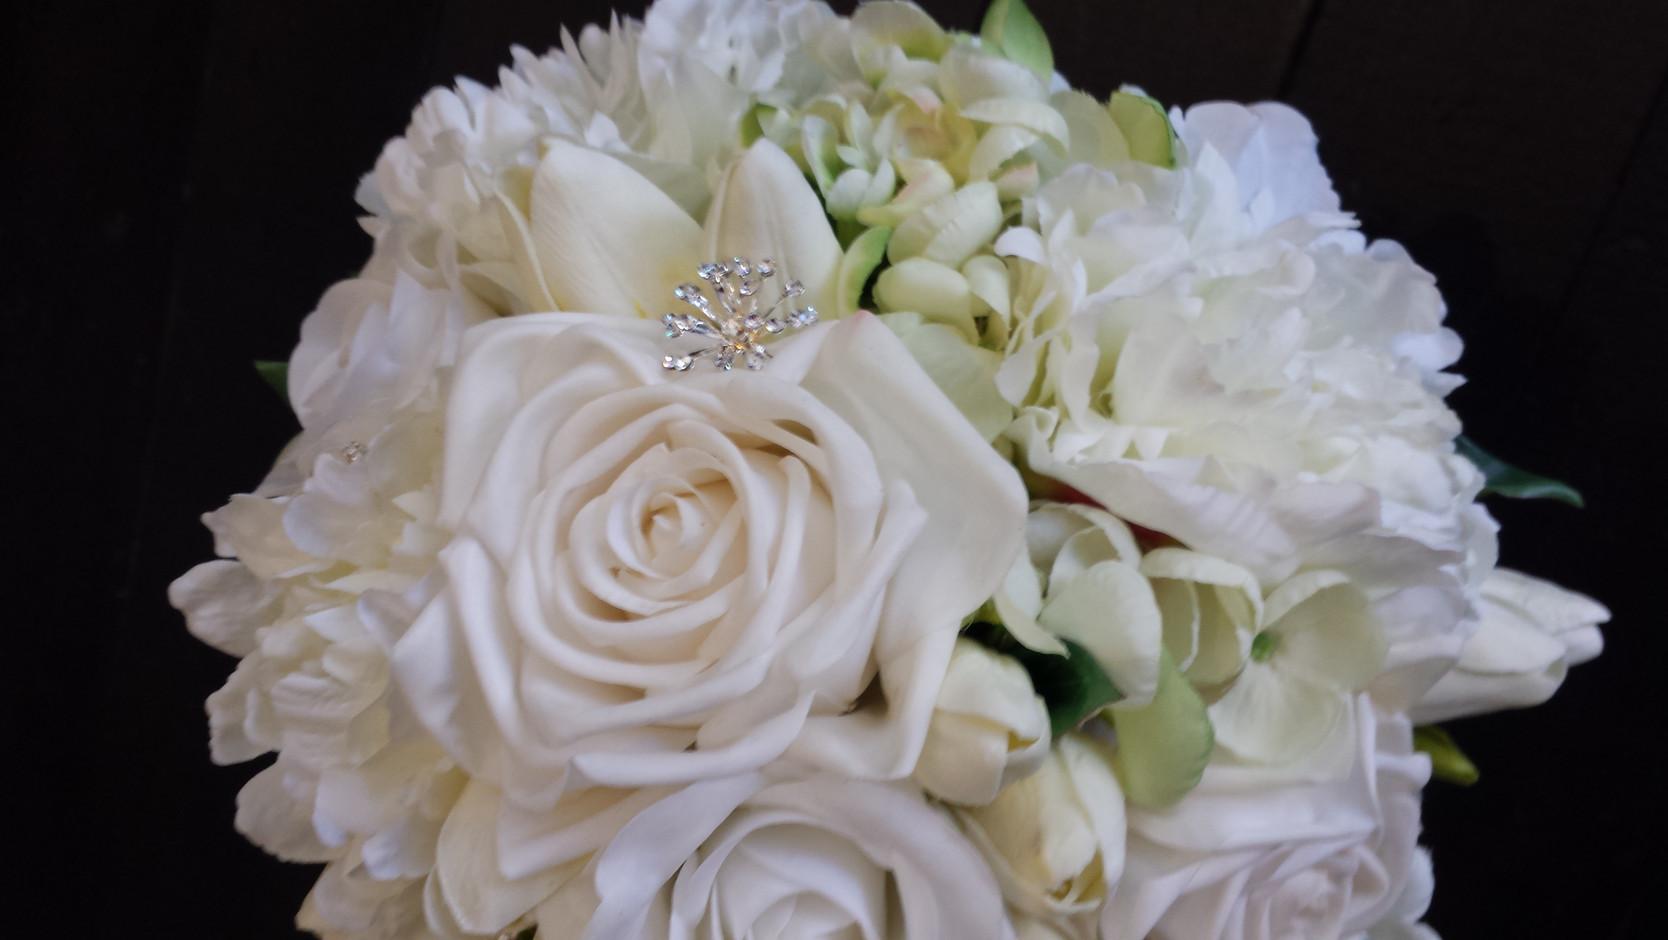 White Roses, Peonies, Tulips & Freesias with Diamantes